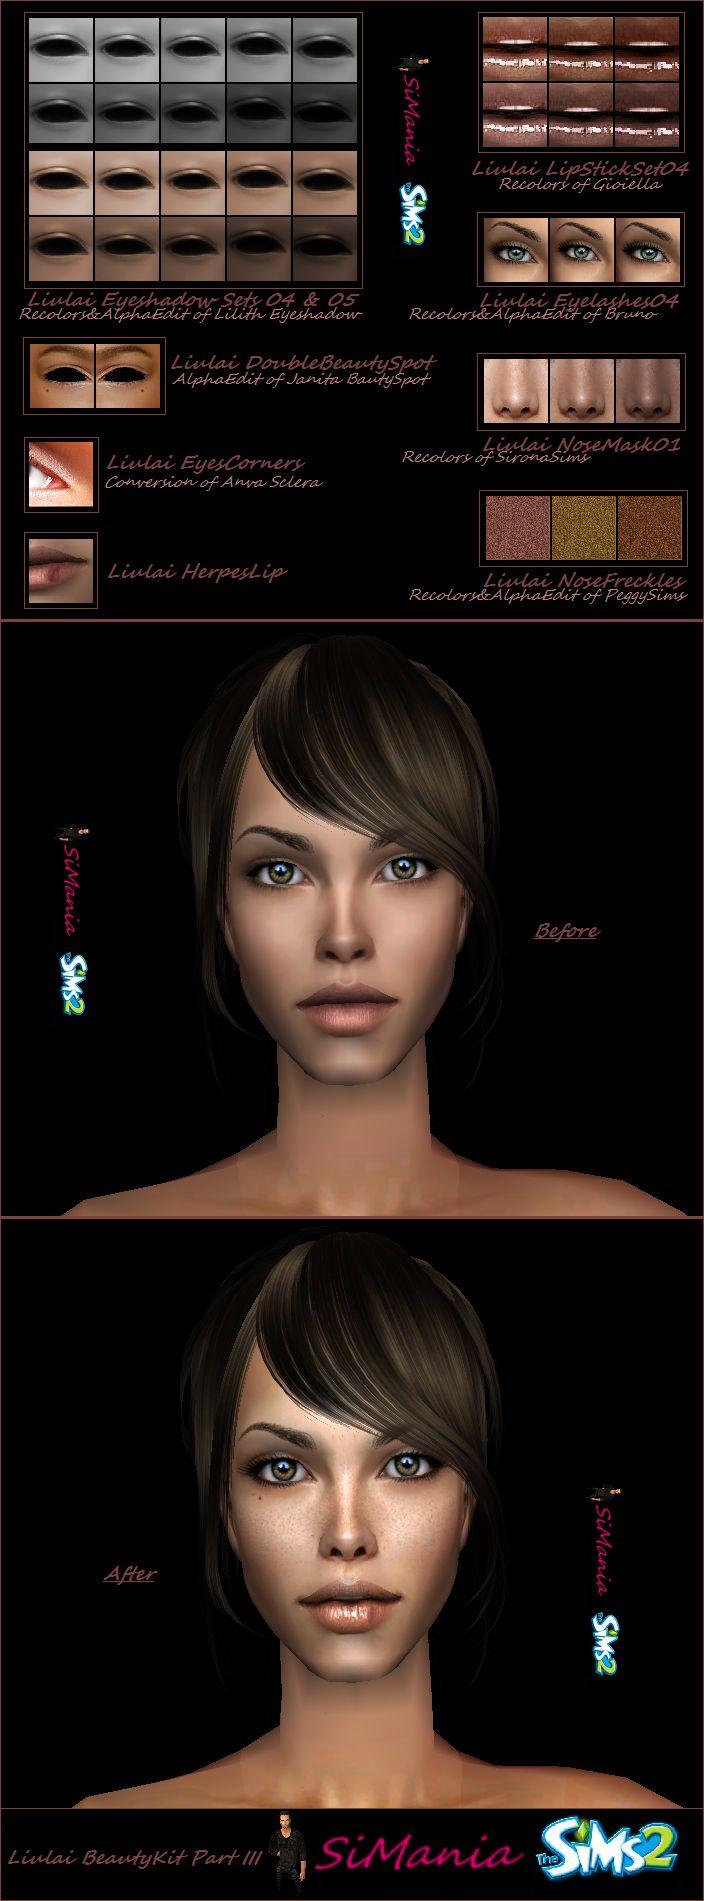 *Download Liulai-BeautyKit Part III http://www.mediafire.com/download/nd6u6h4kzludmi5